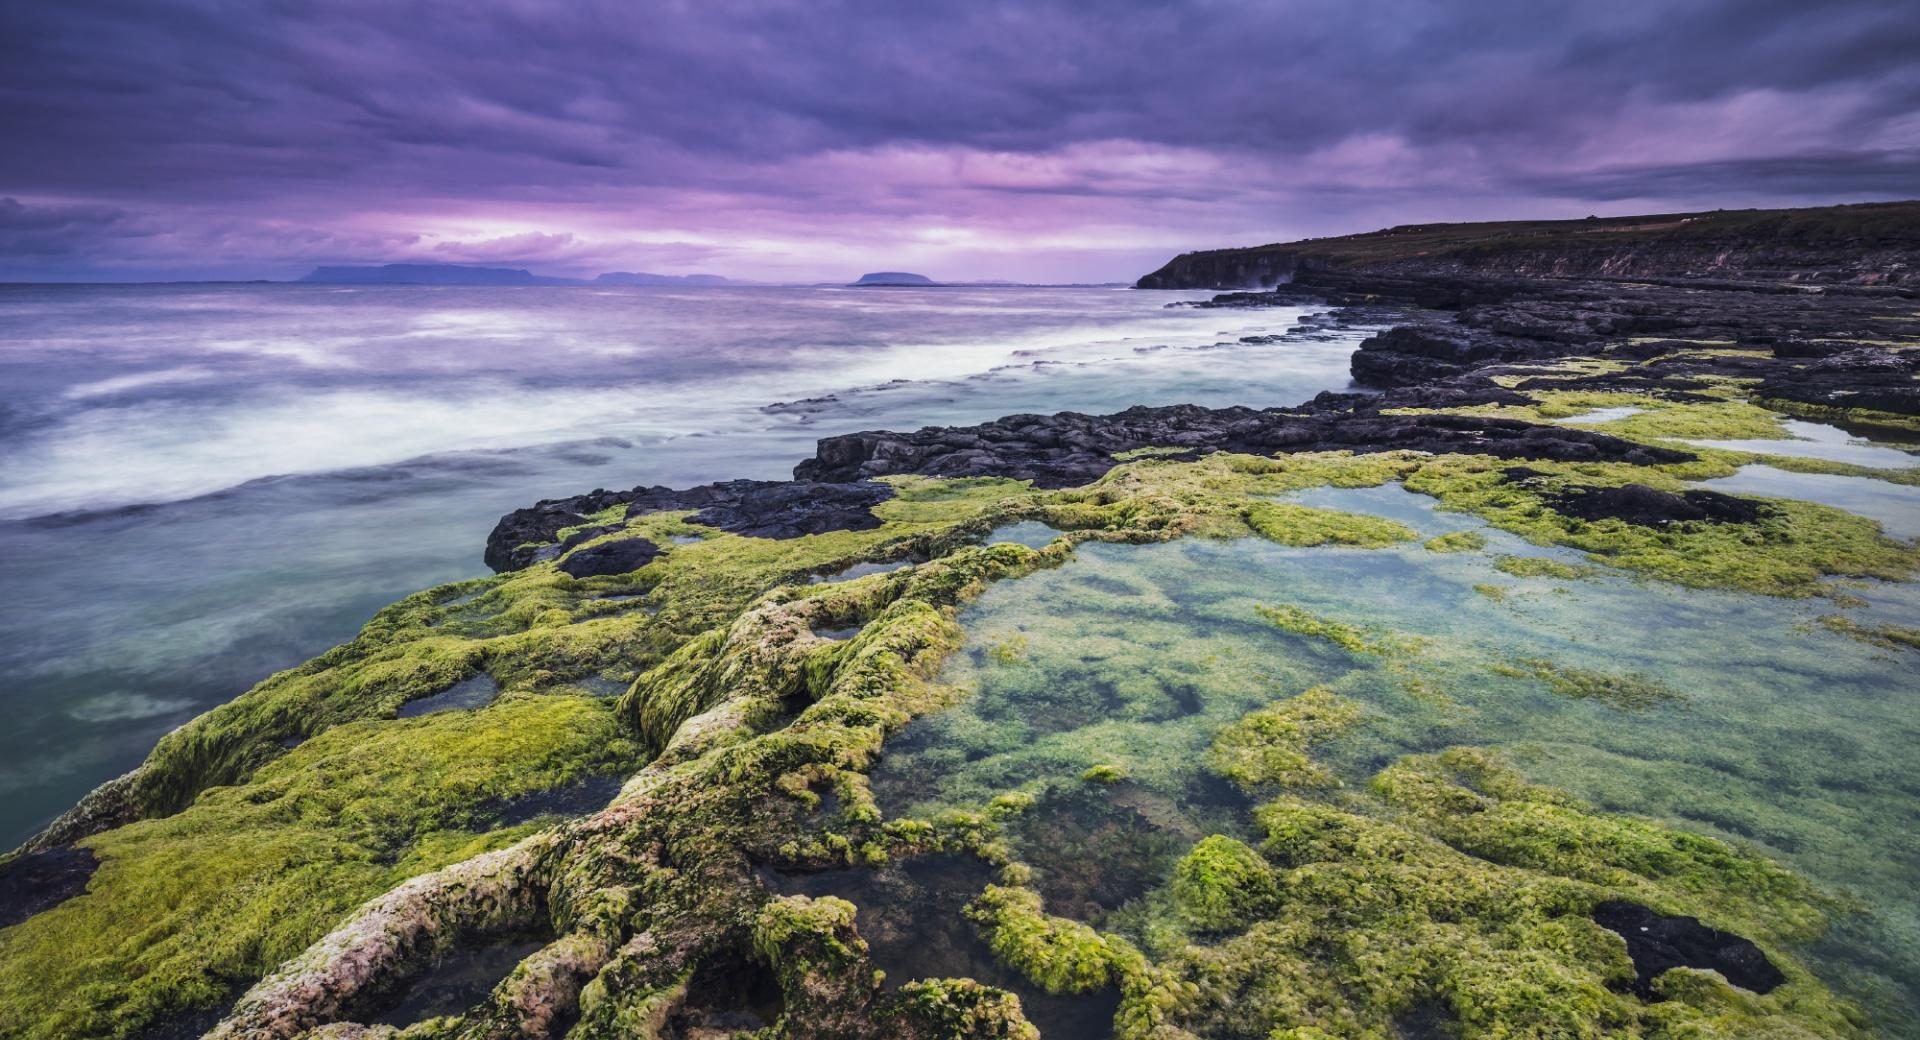 Rocks and Algae wallpapers HD quality